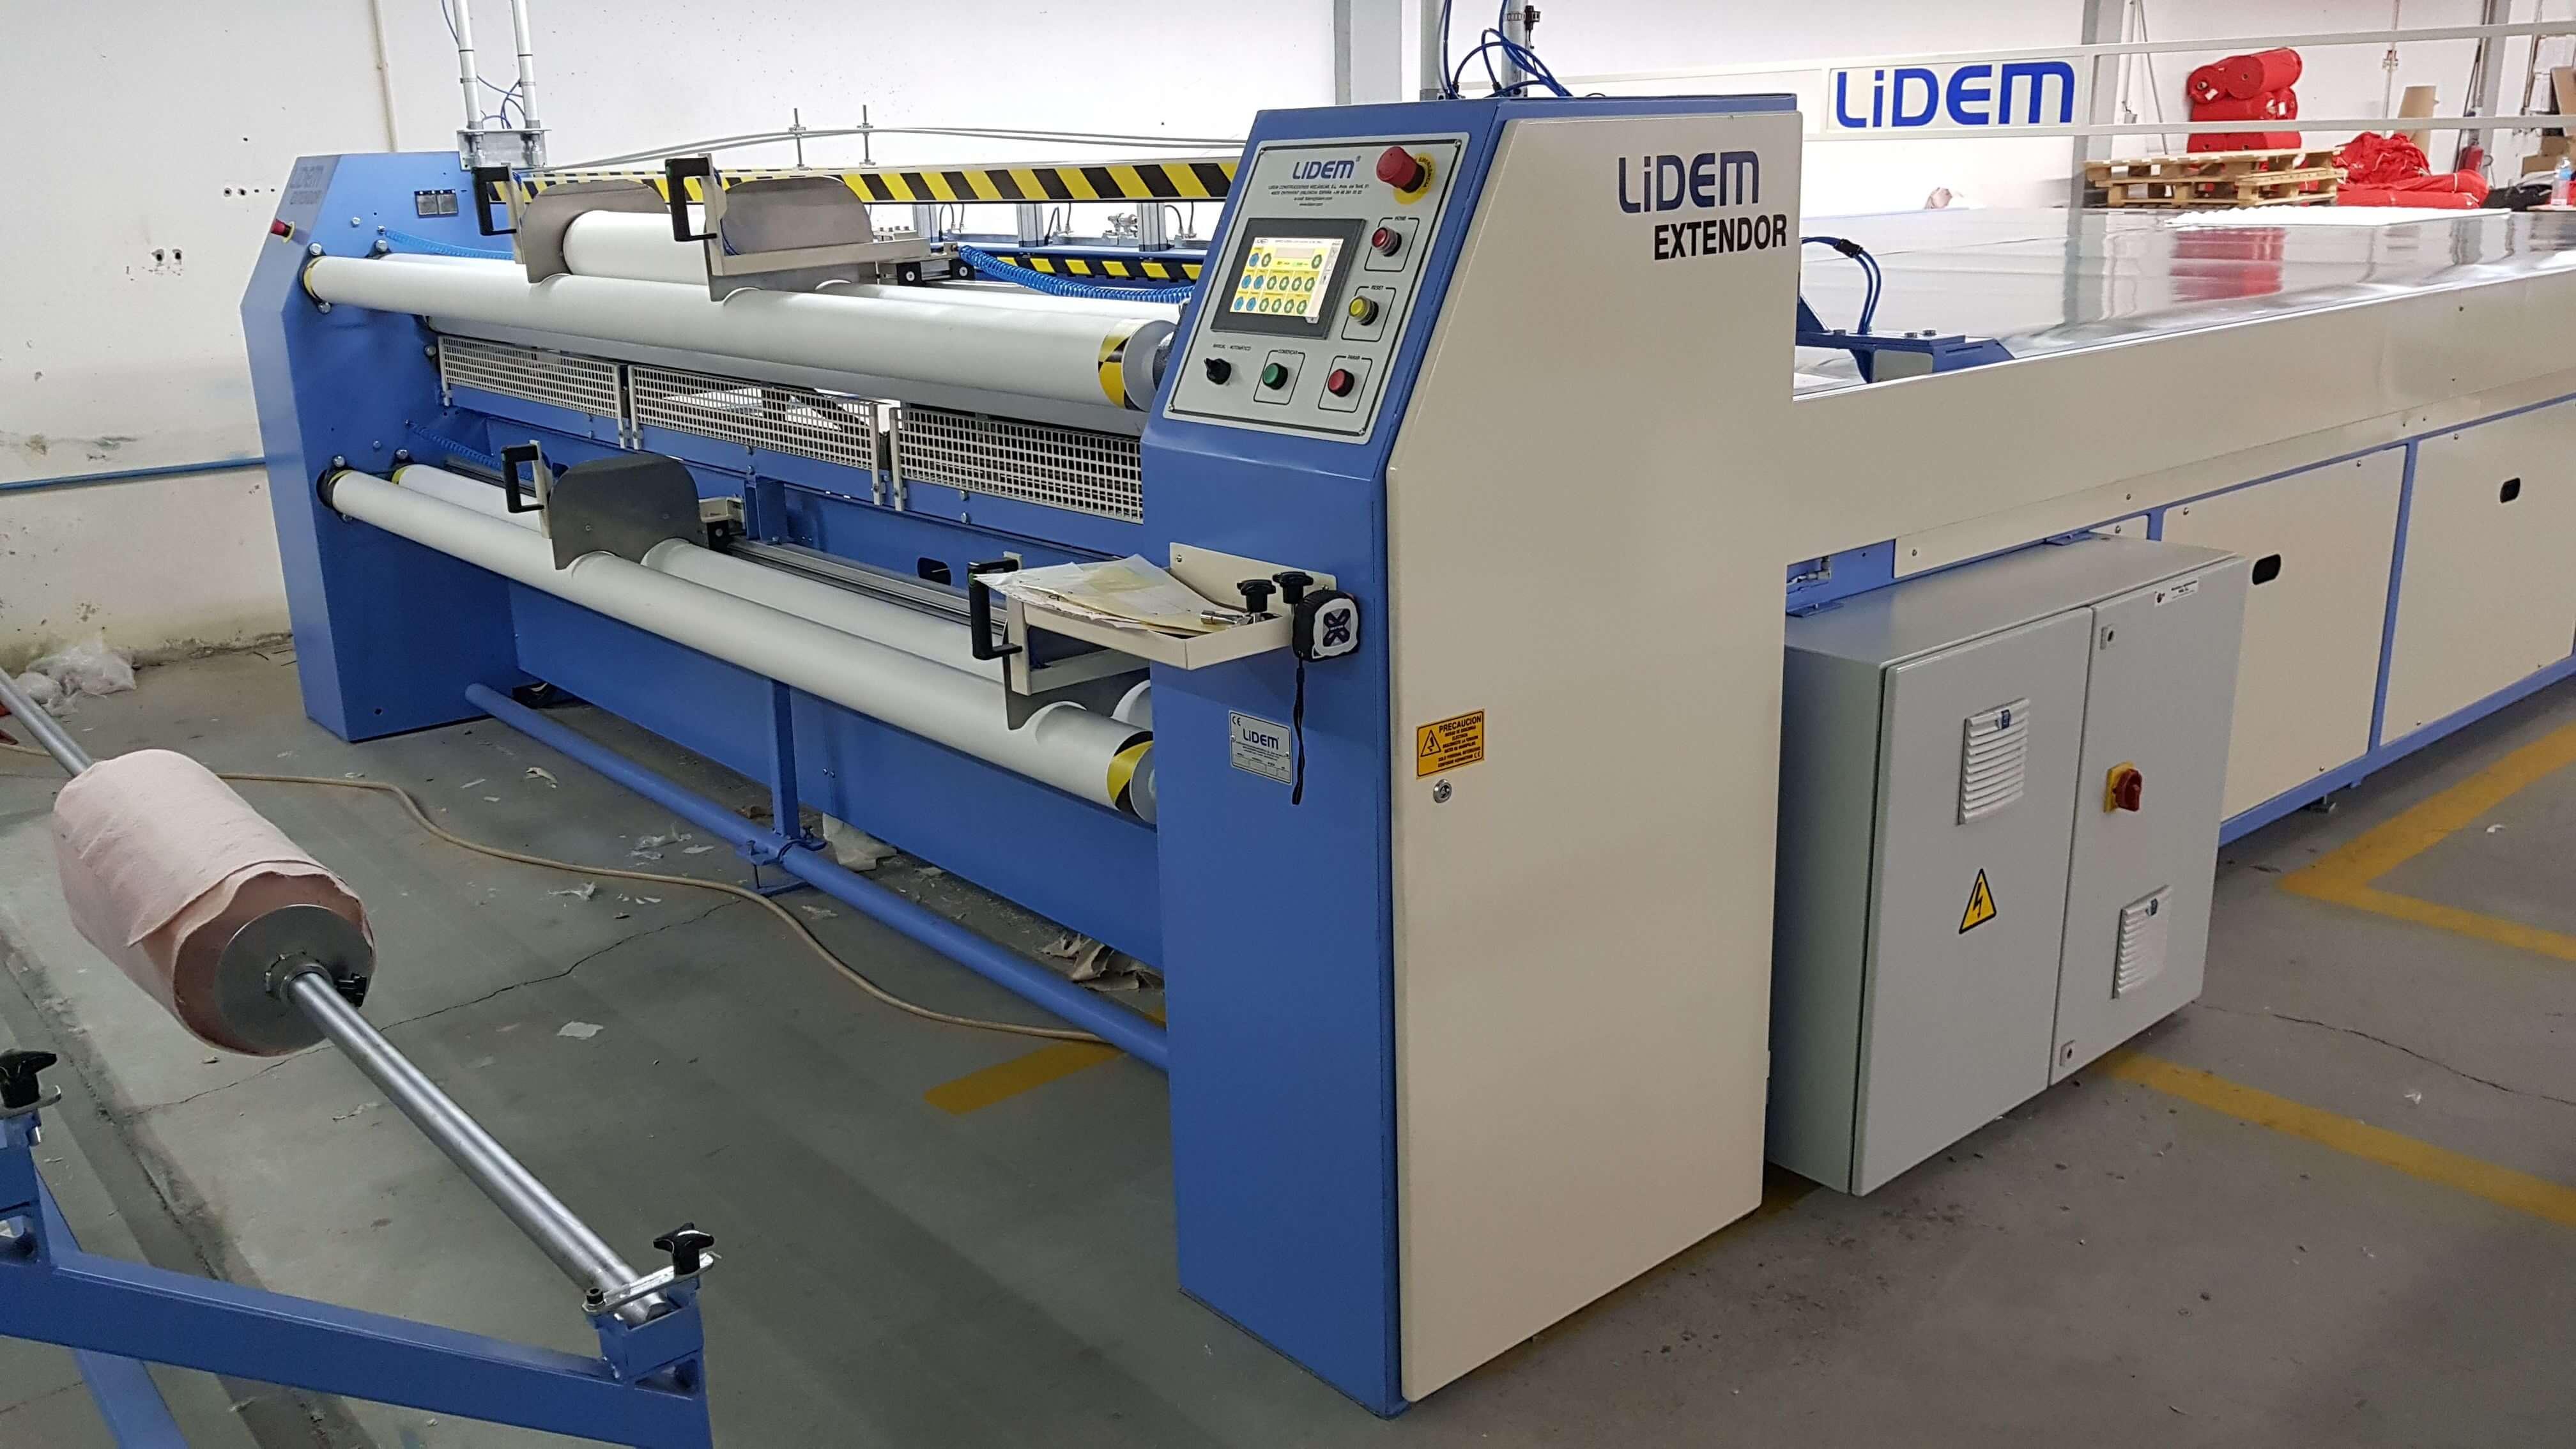 Máquina Extendor Lidem - Inel